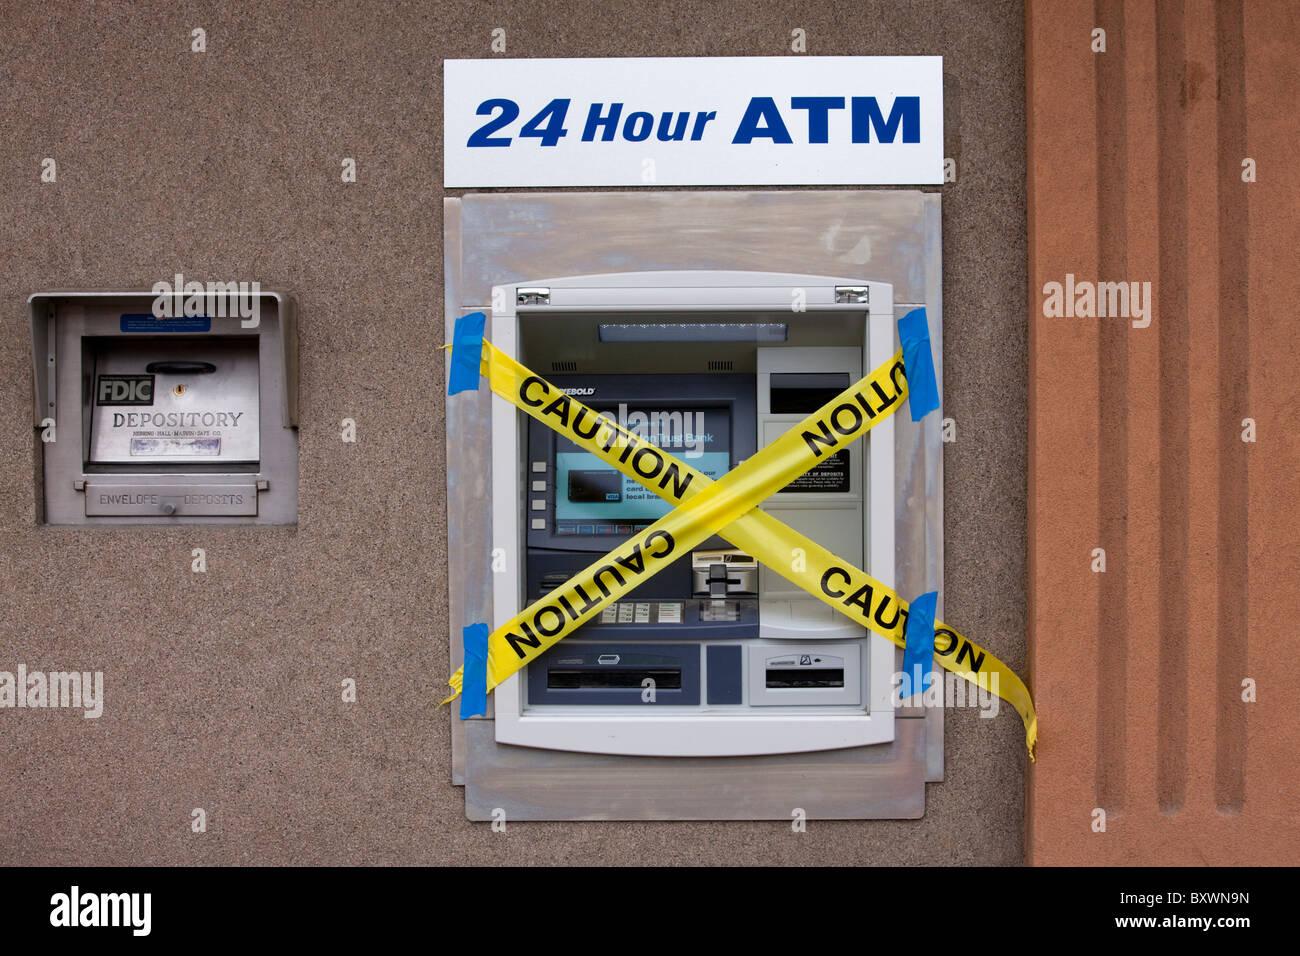 USA, Washington, Ephrata, Bank ATM machine covered with caution tape - Stock Image